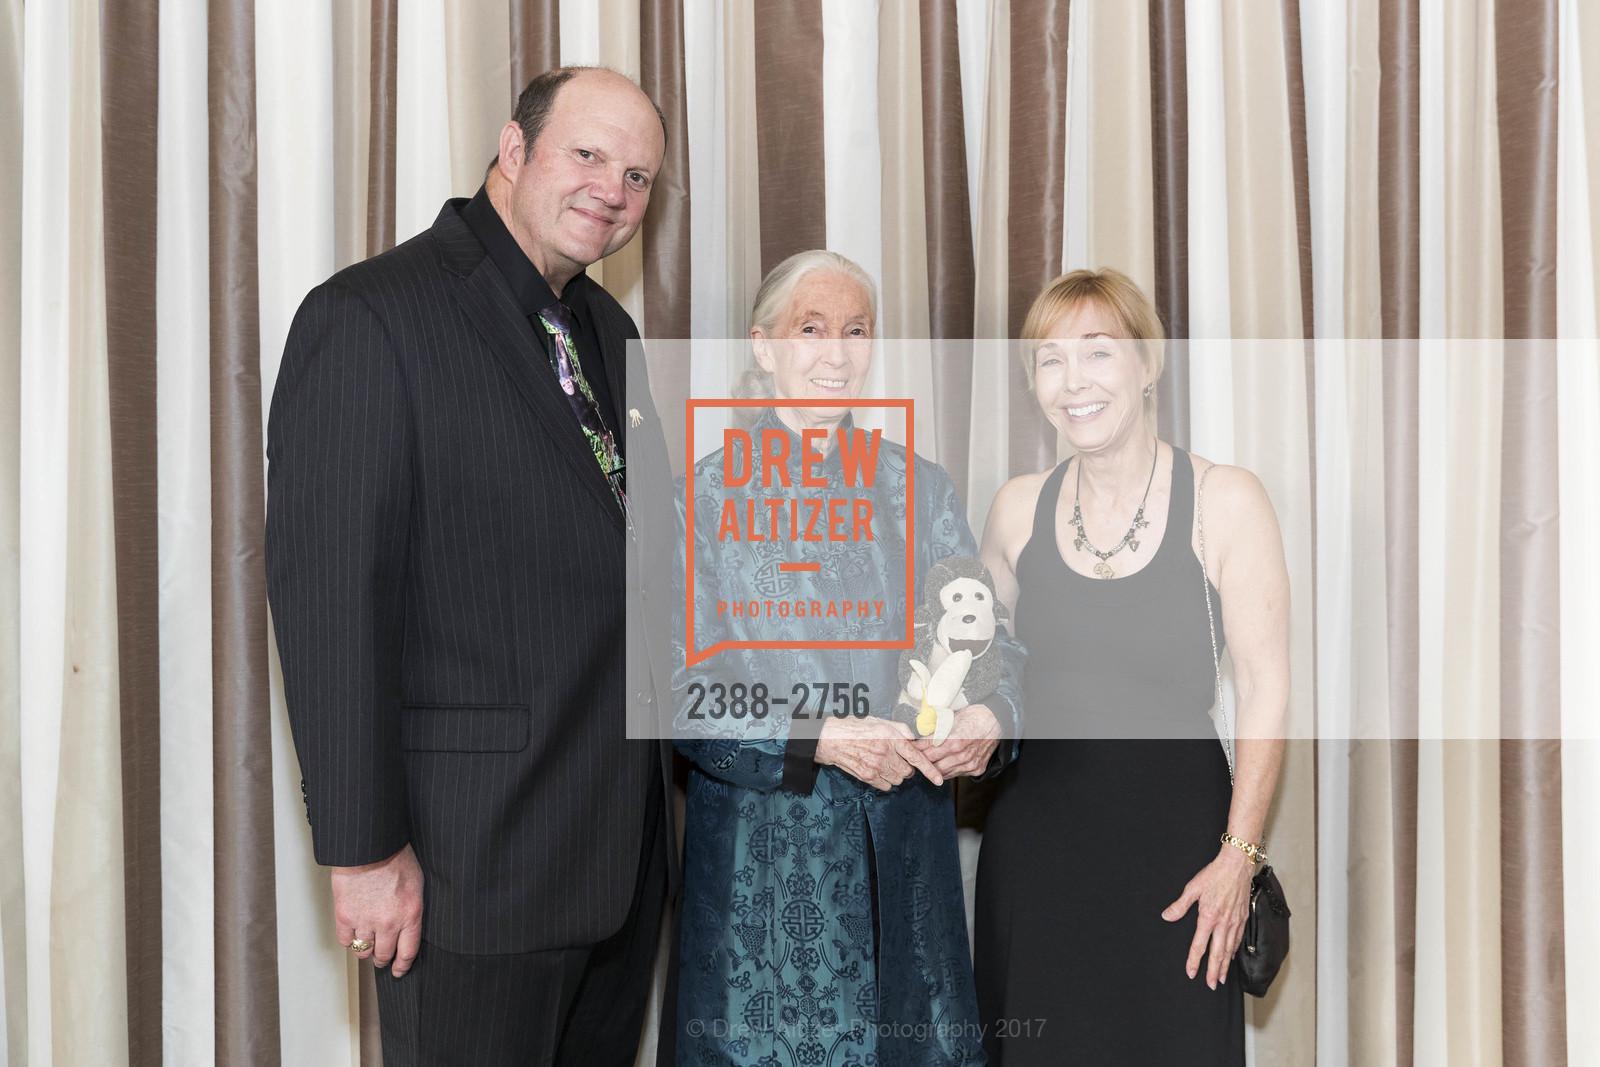 Mark Crowe, Jane Goodall, Becci Crowe, Photo #2388-2756